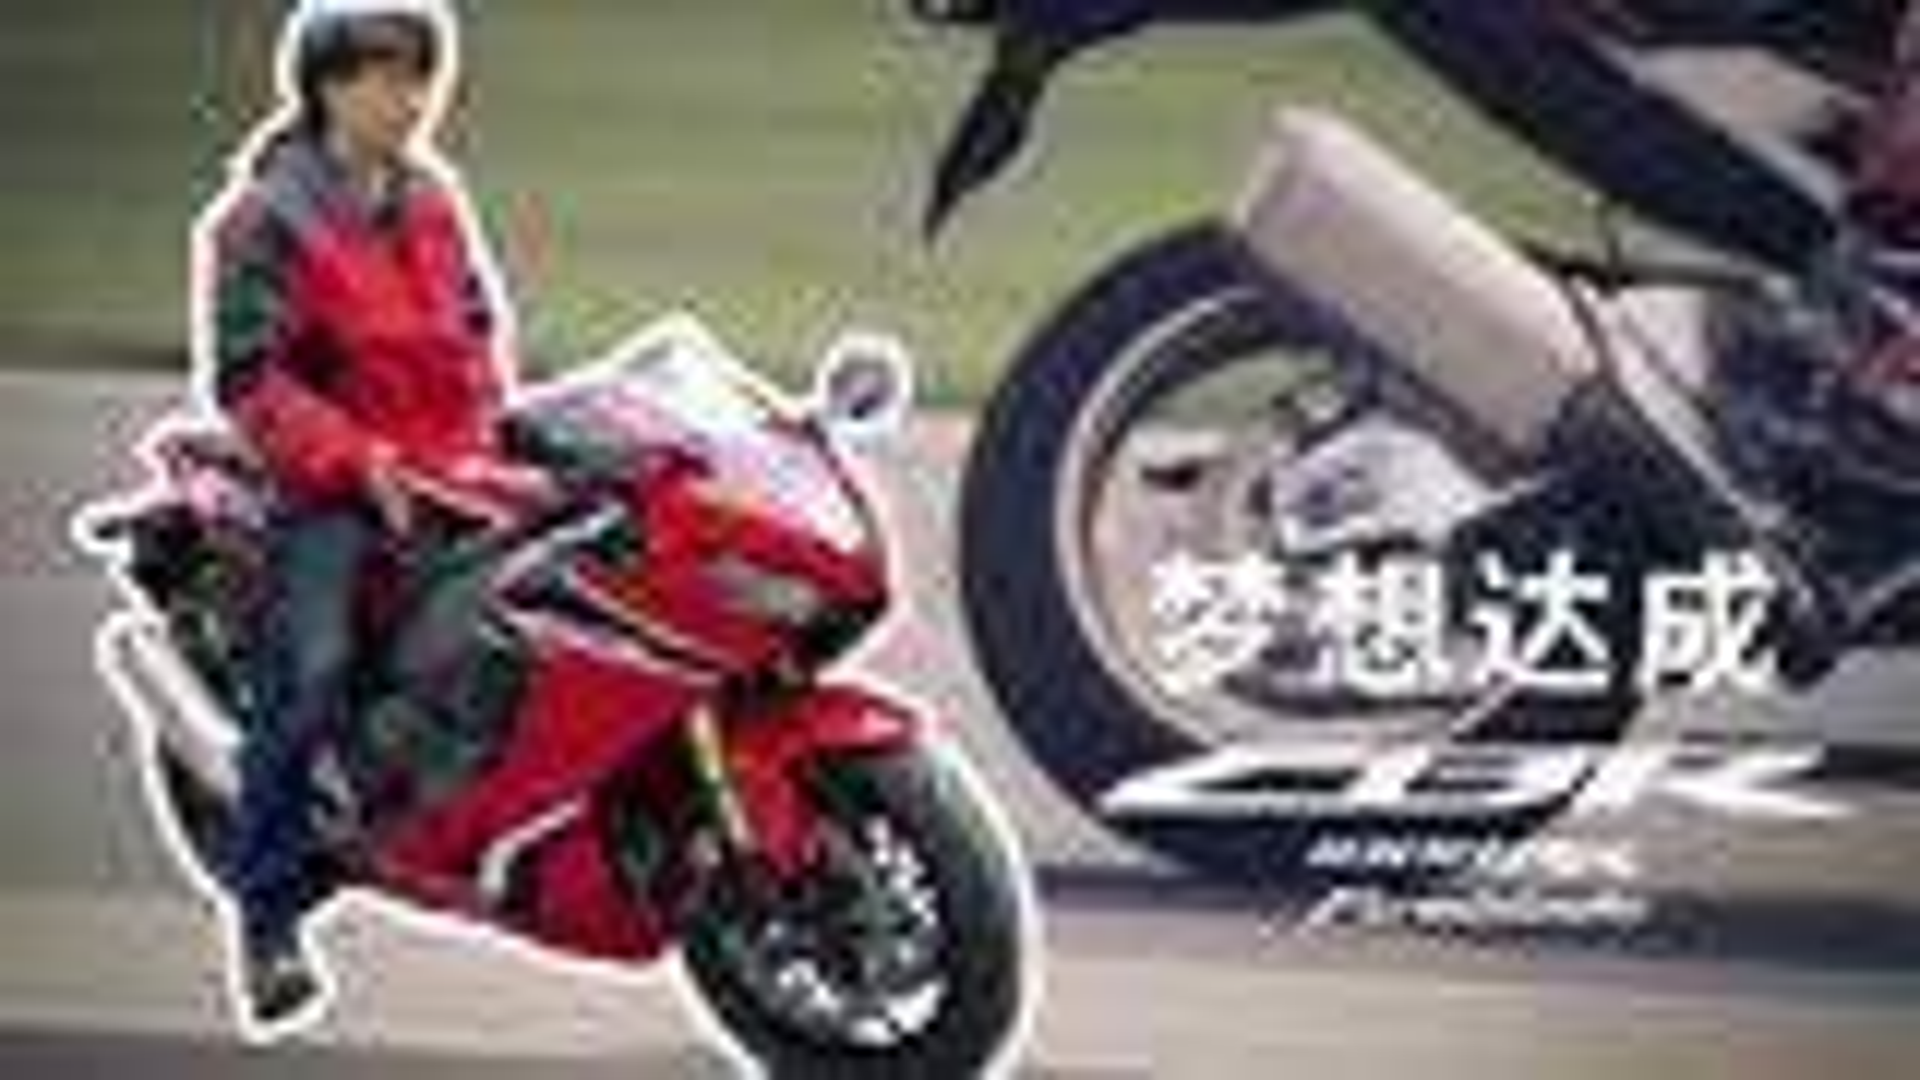 Honda is the best!终极梦想达成! 本田CBR1000RR火刃提车!